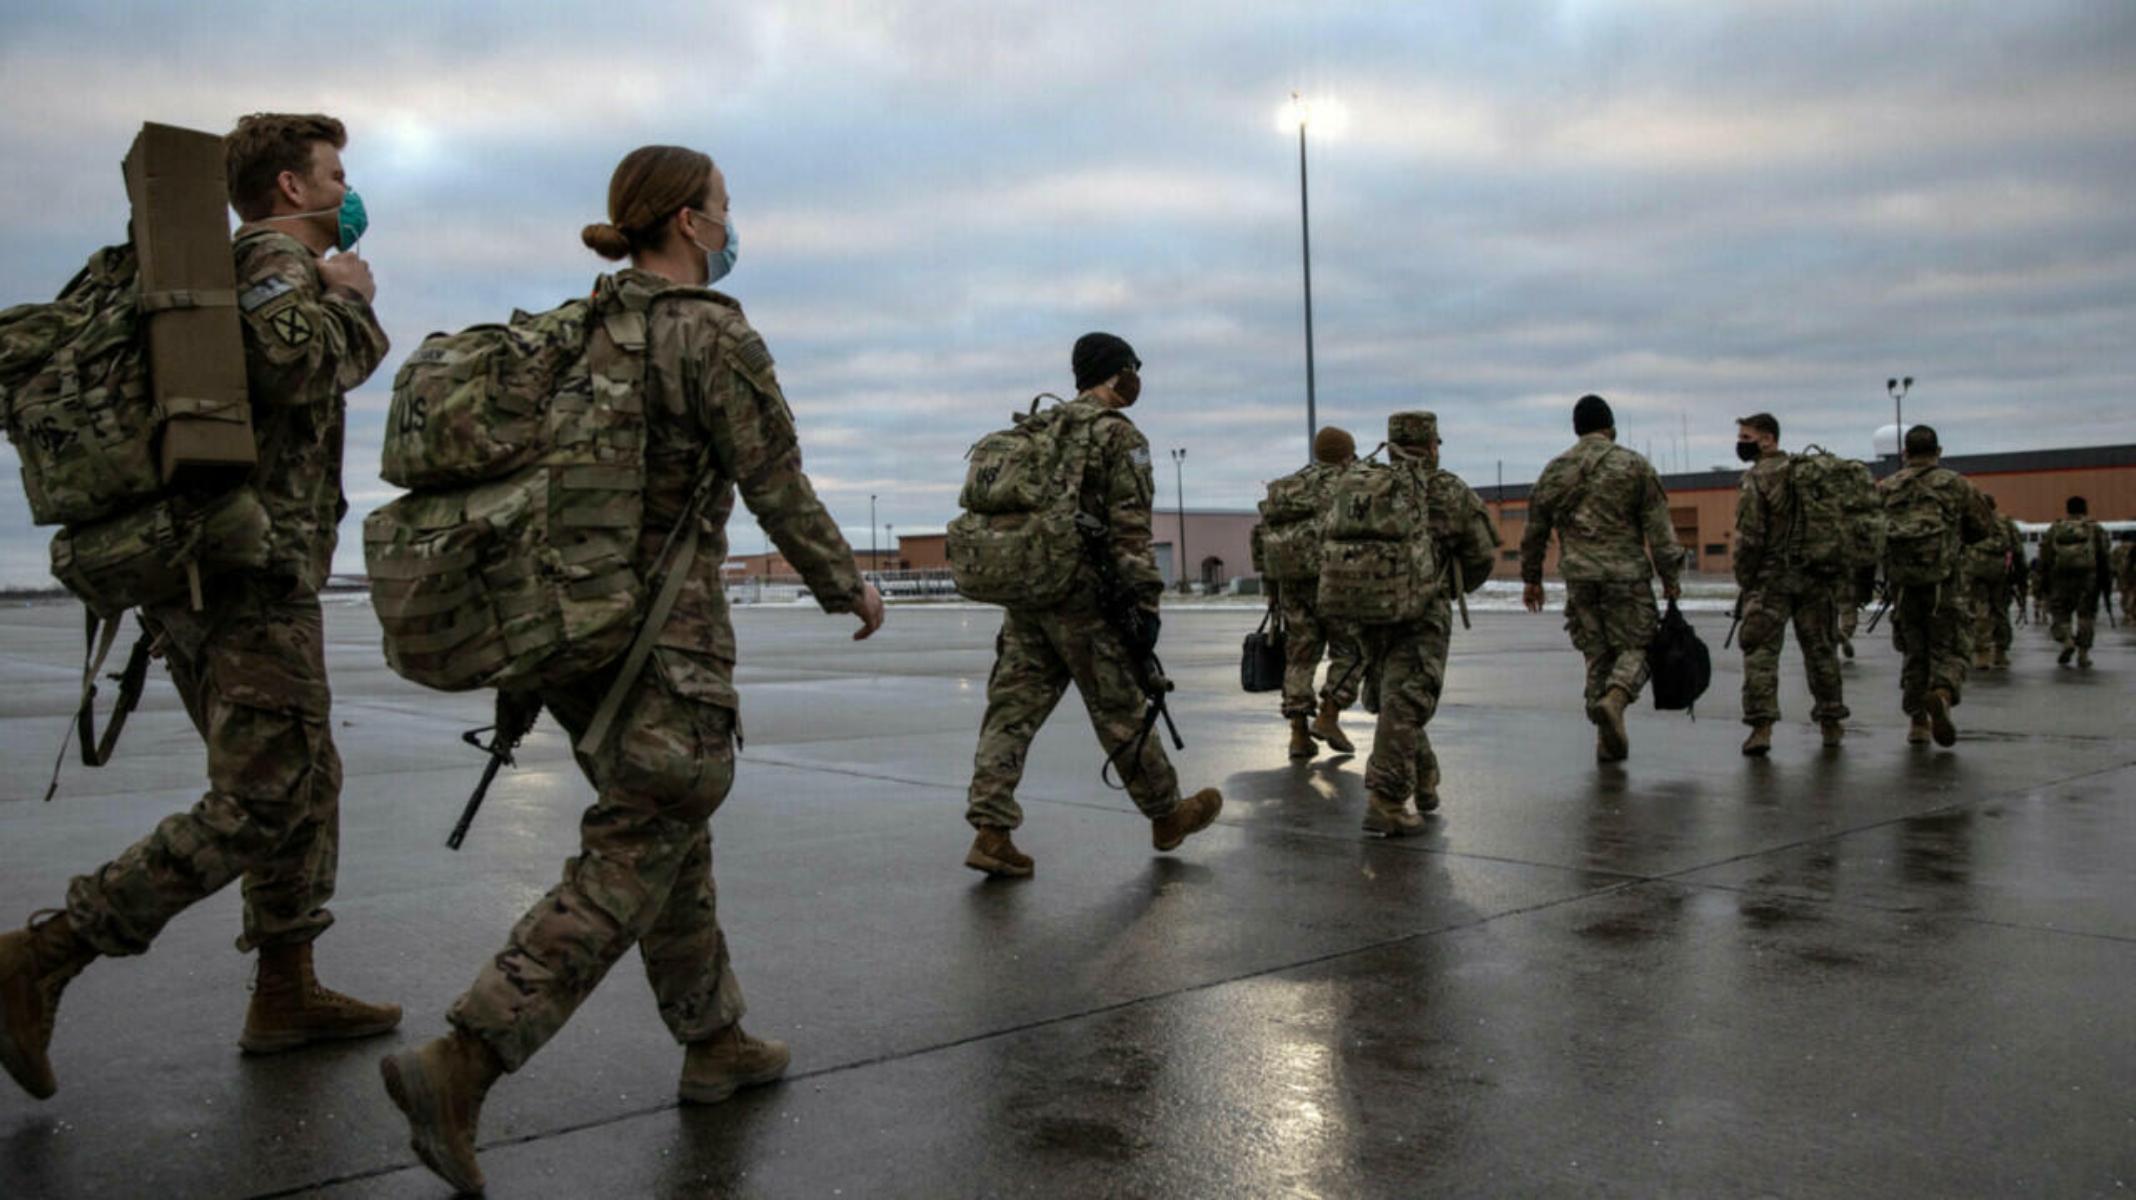 EU da por terminada retirada de sus tropas en Afganistán: Pentágono